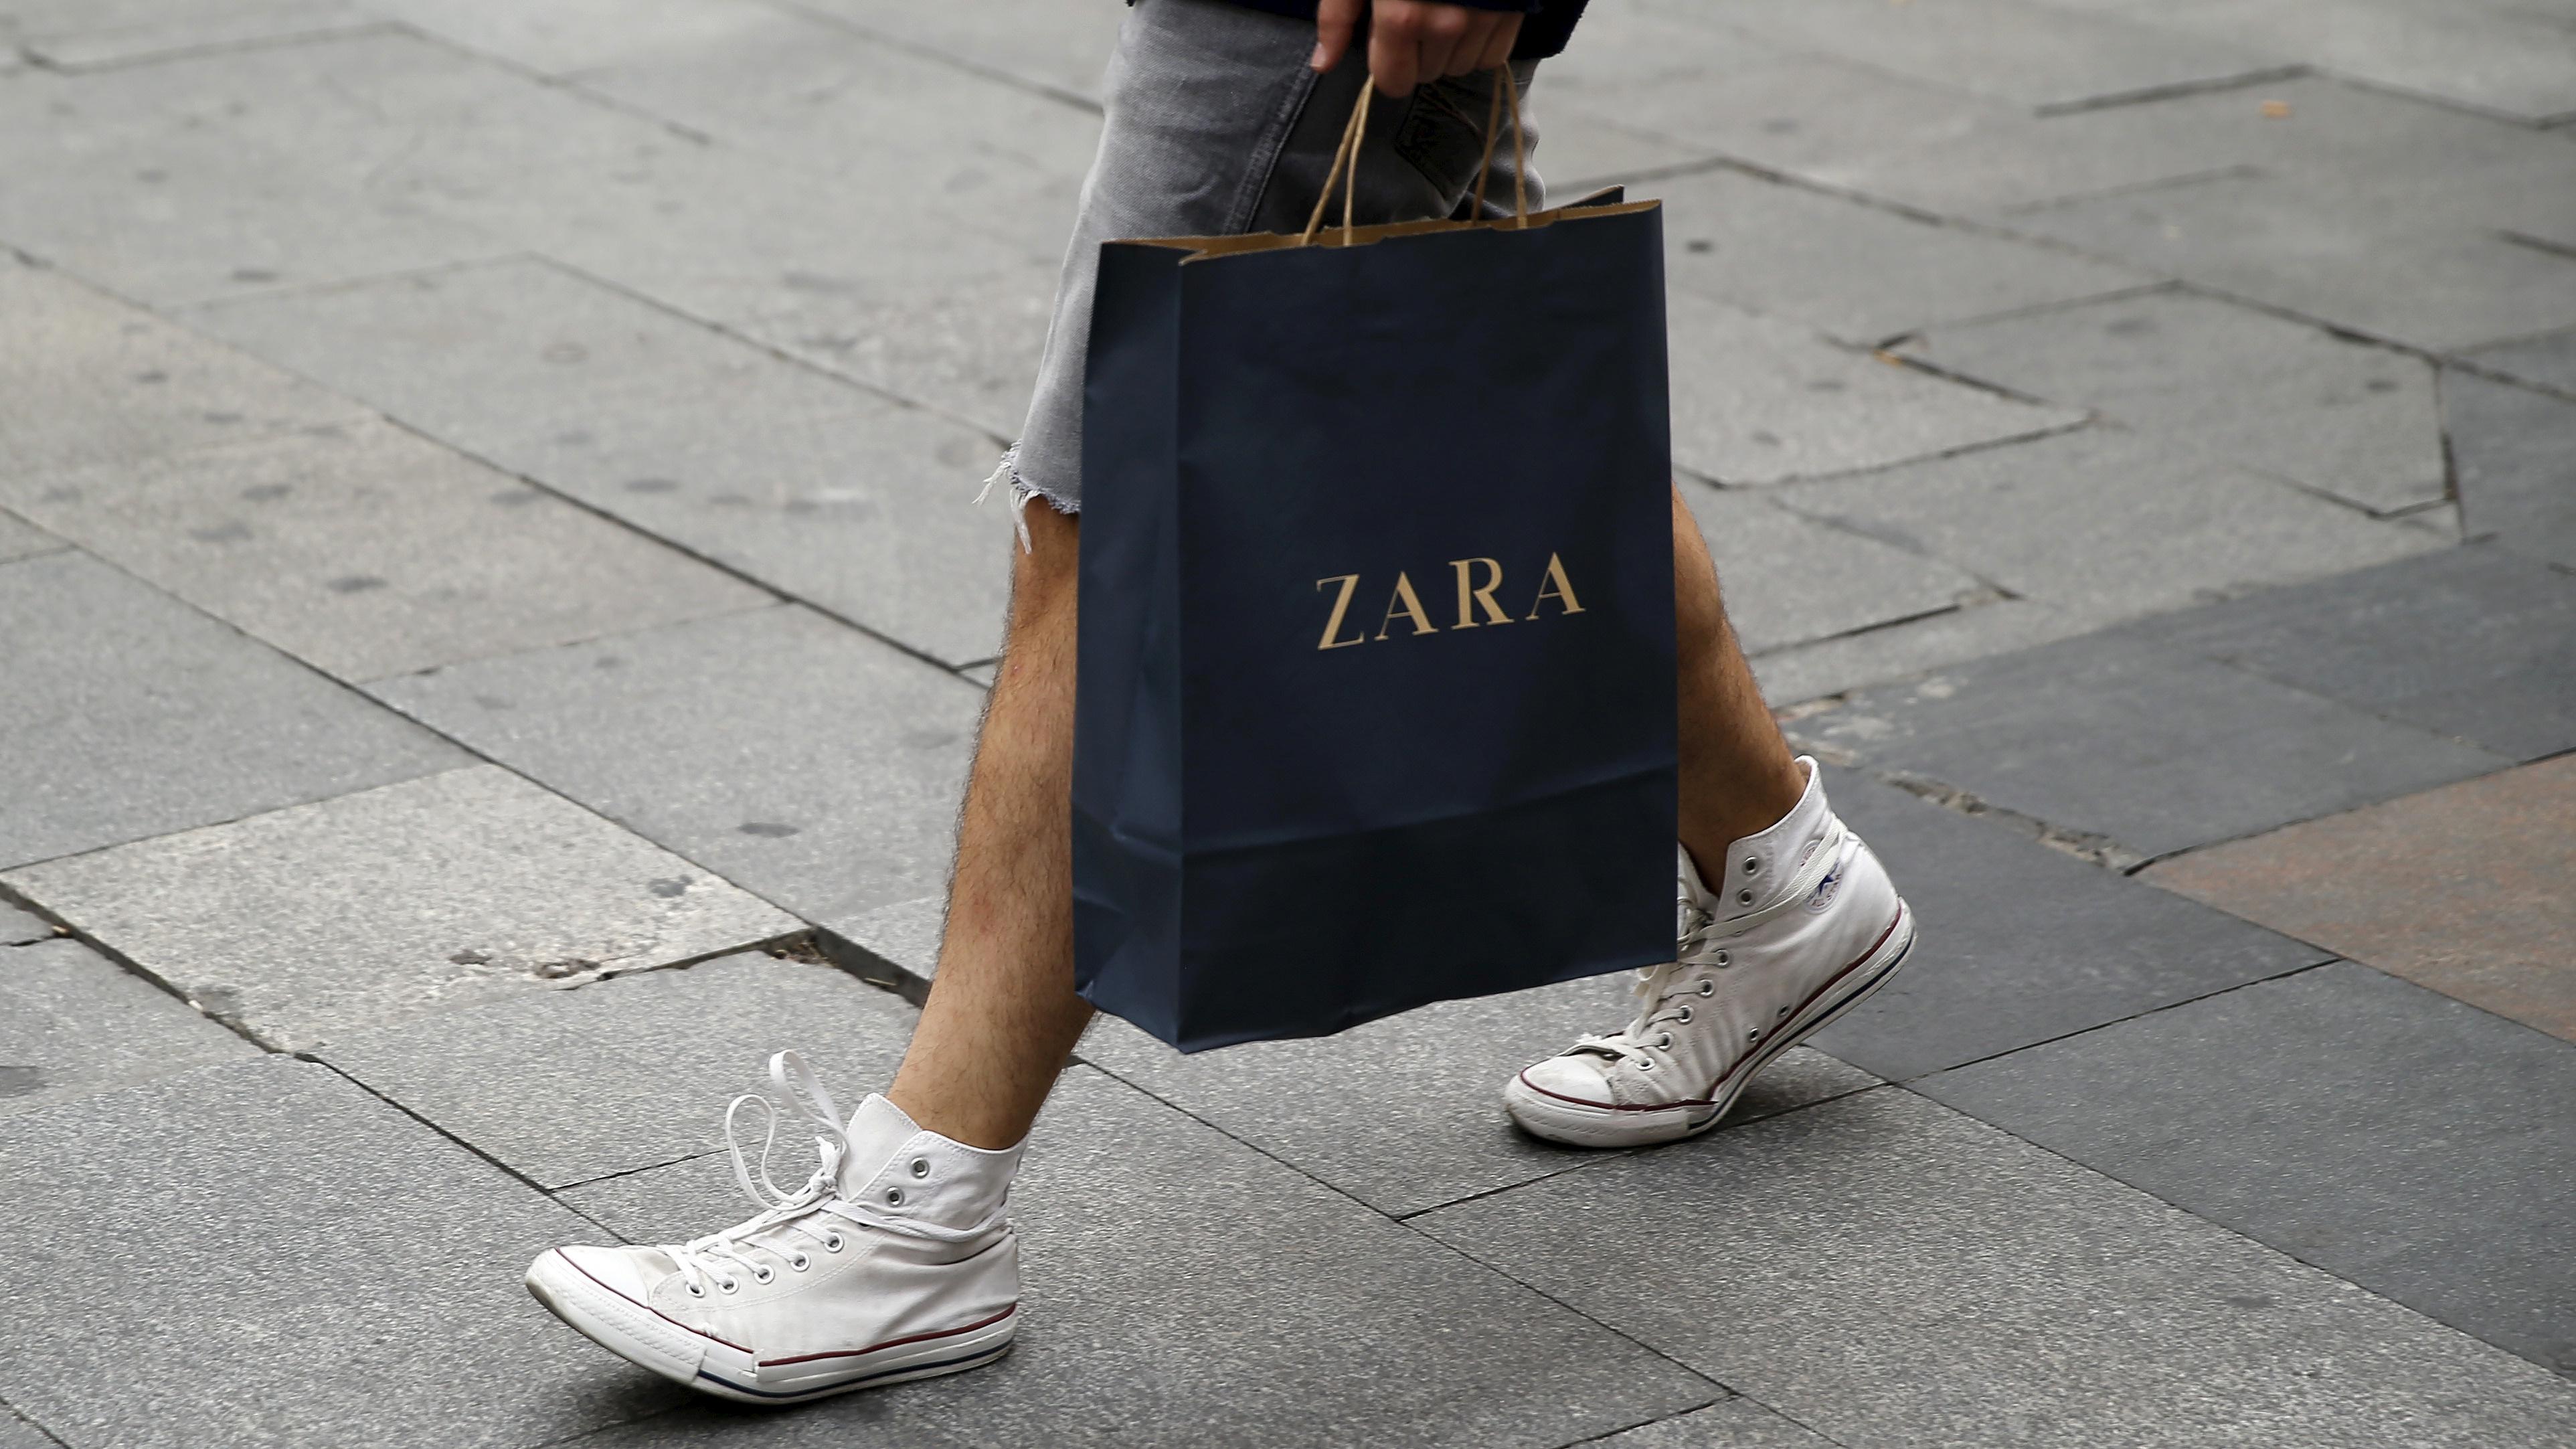 A man walks with a Zara bag in Madrid, Spain, June 10, 2015.